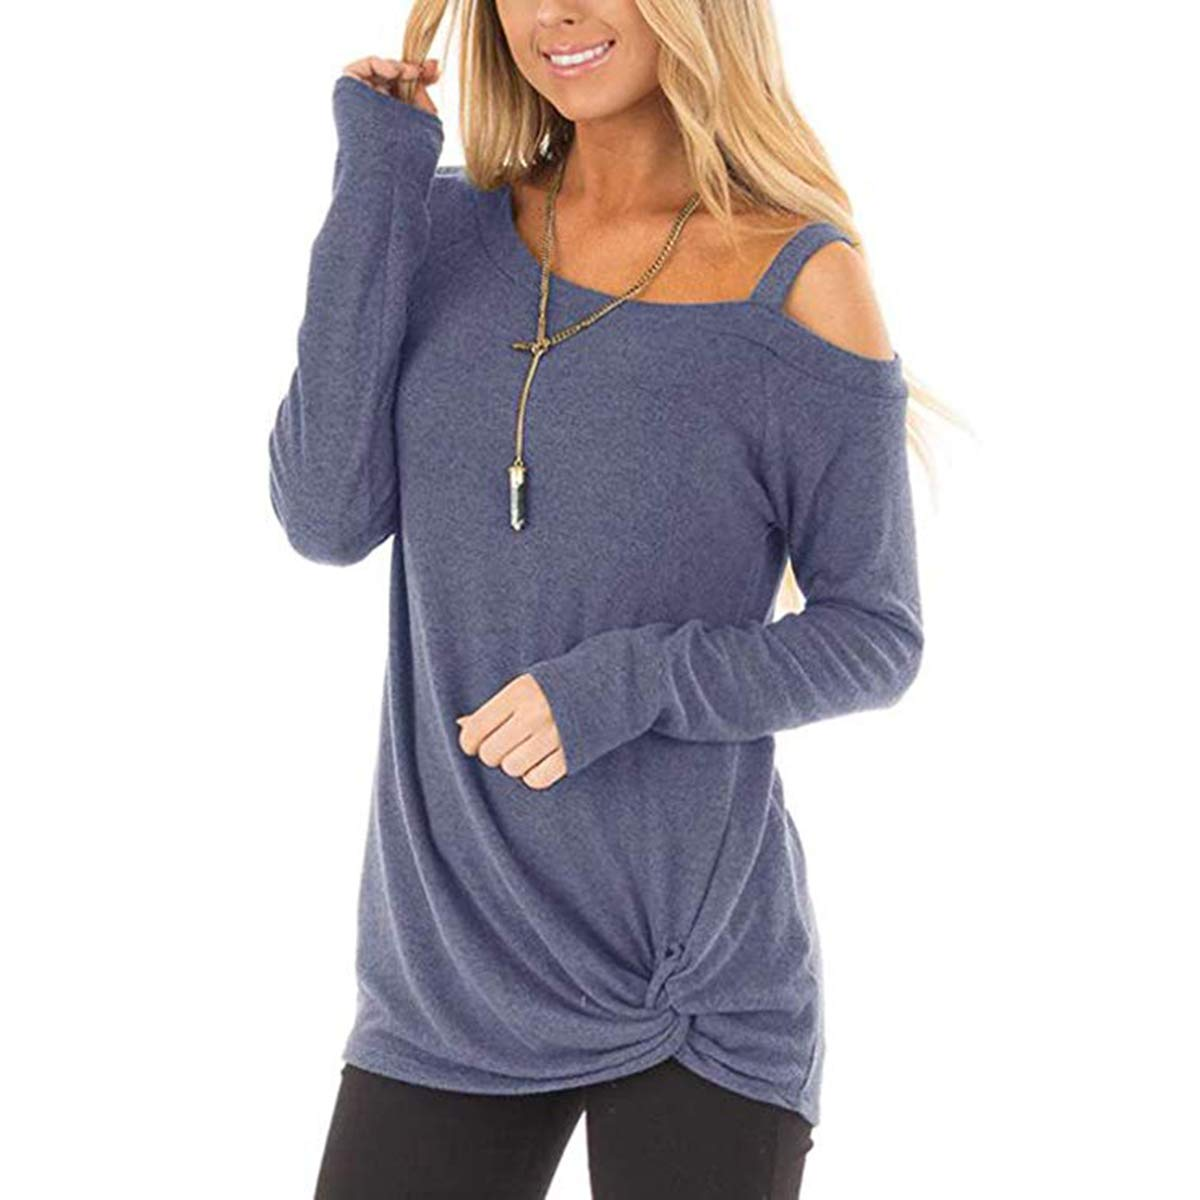 Coldshoulder Purple Ilfioreemio Women Knit Tunic Top Round Neck Blouse Knot Twist Front Long Sleeve Casual Soft Sweatshirt